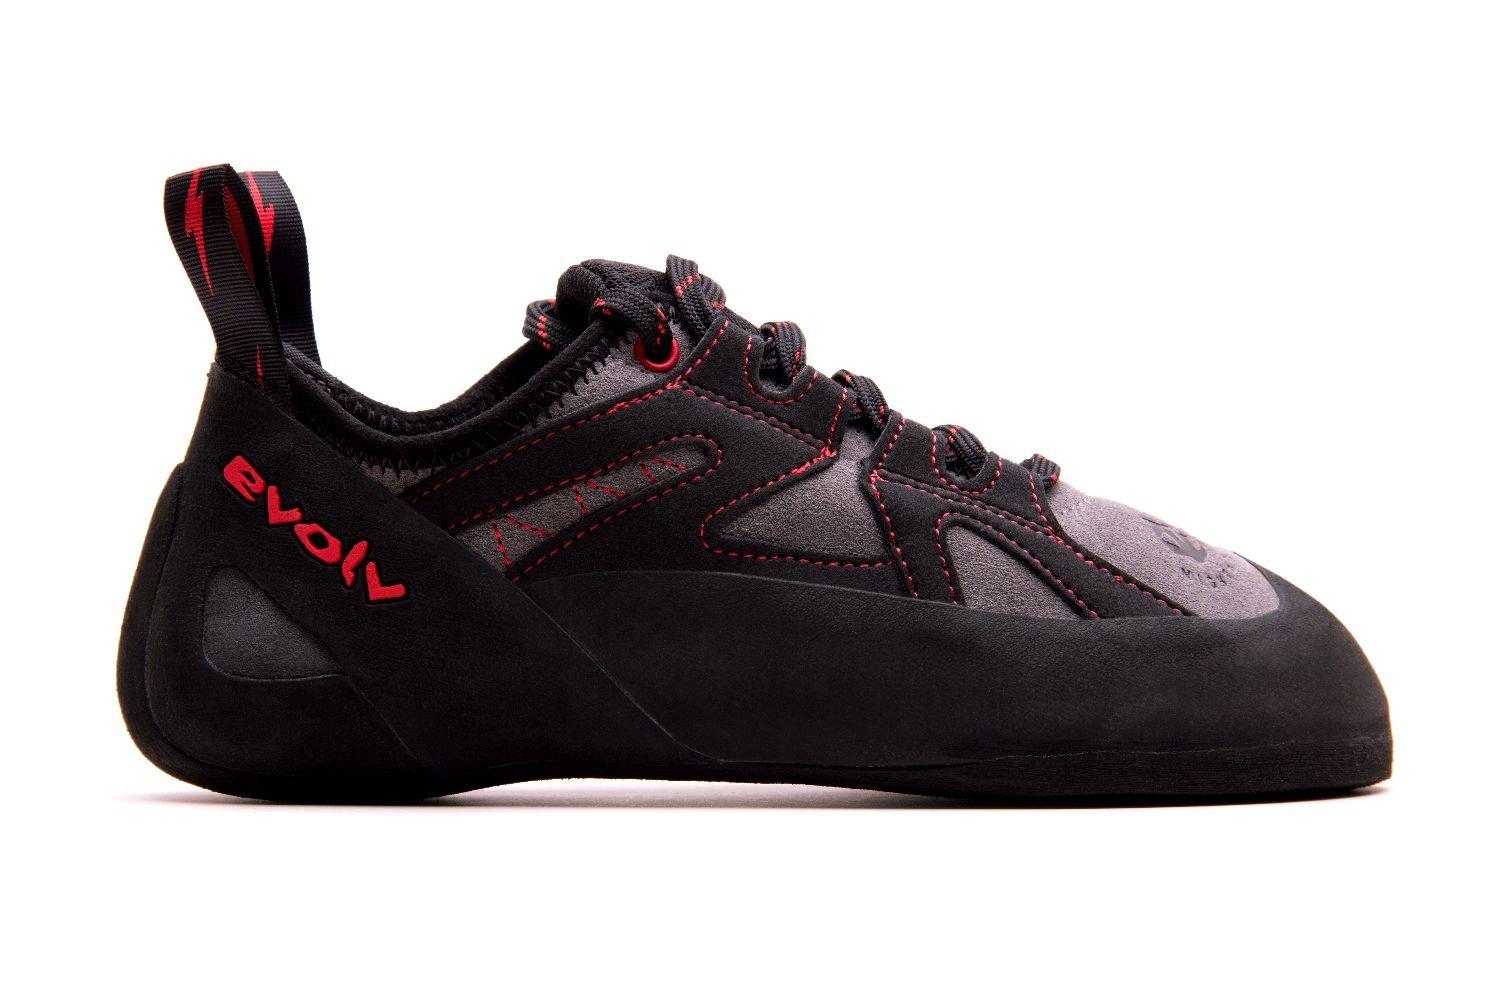 Evolv Nighthawk Climbing Shoe - Men's Gray/Black 12.5 by Evolv